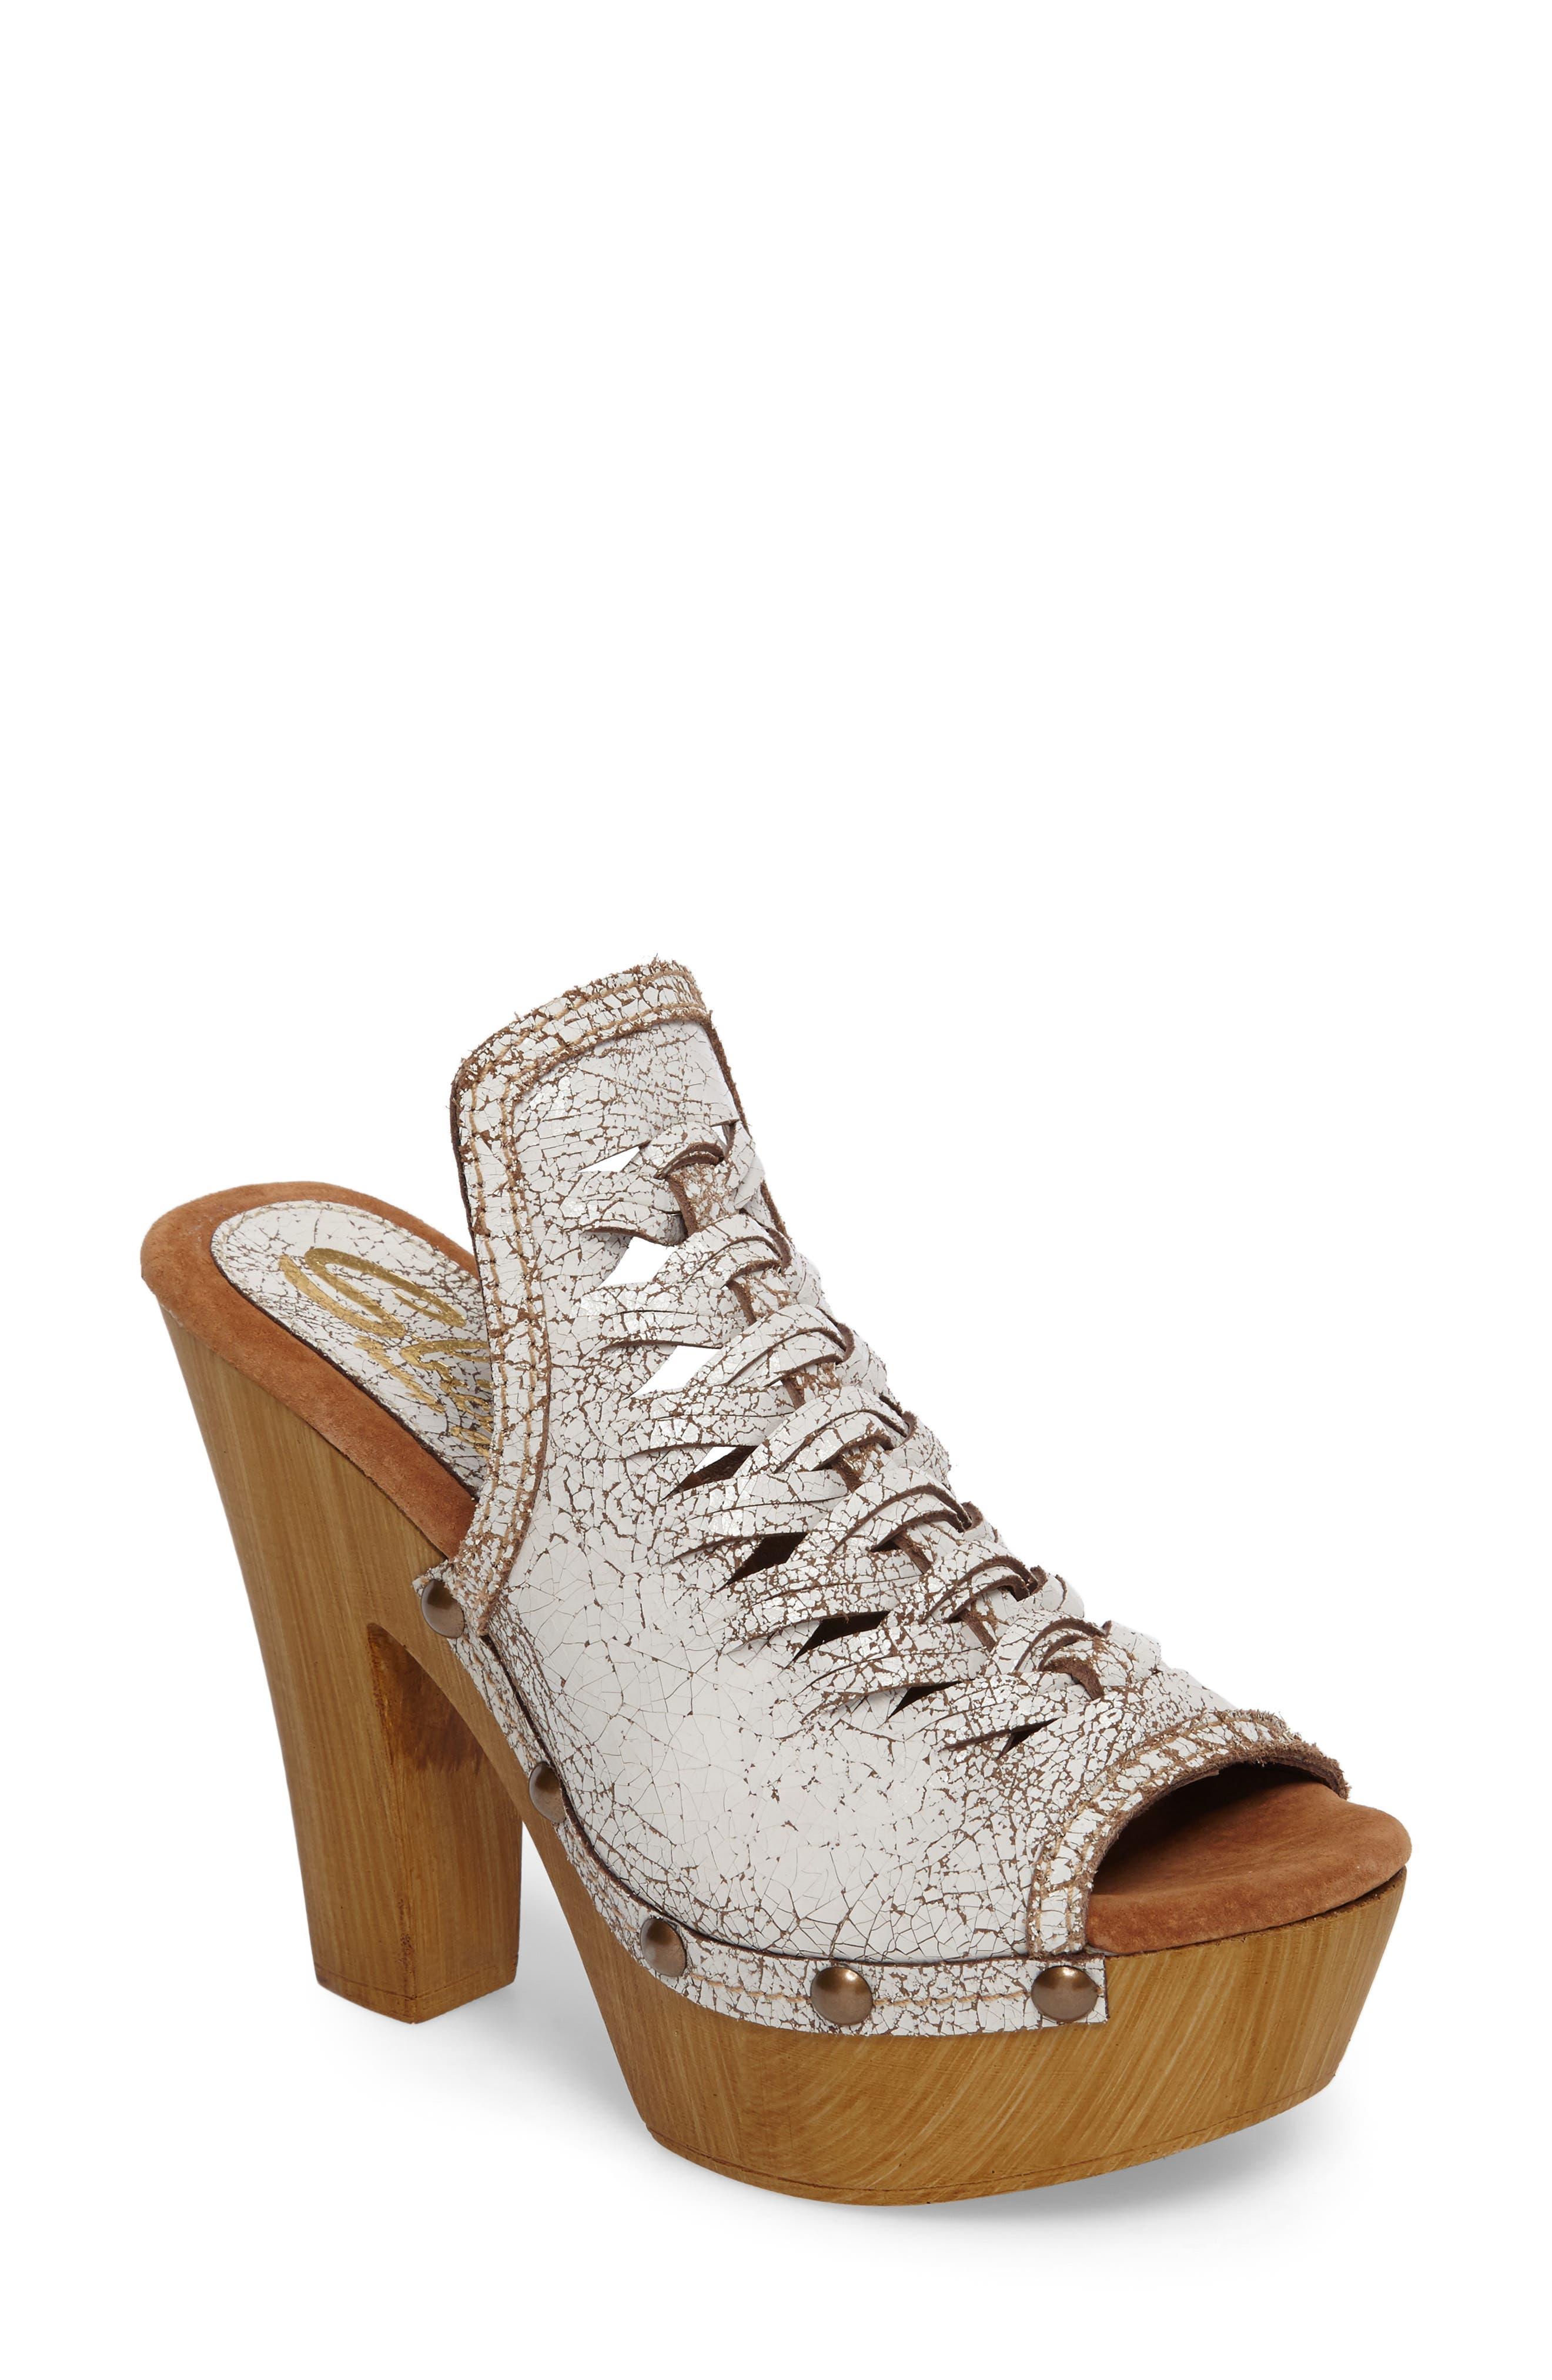 Kinga Platform Sandal,                         Main,                         color, White Leather